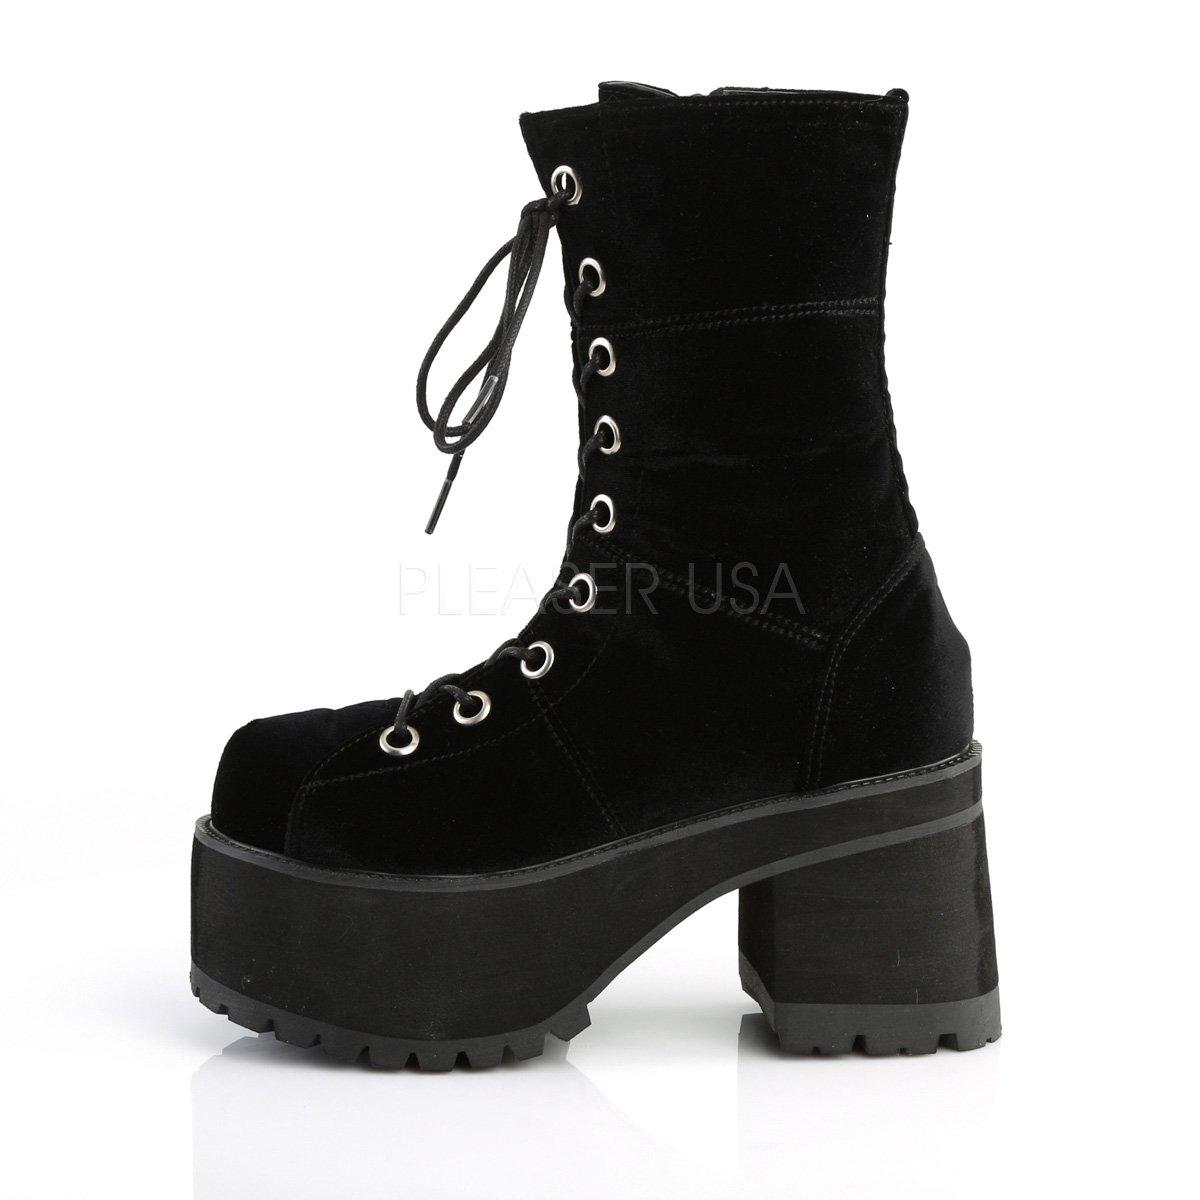 38814879edc0 Demonia Womens Industrial gothic punk ankle lace-up boots Ranger-301 black  velvet  Amazon.co.uk  Shoes   Bags